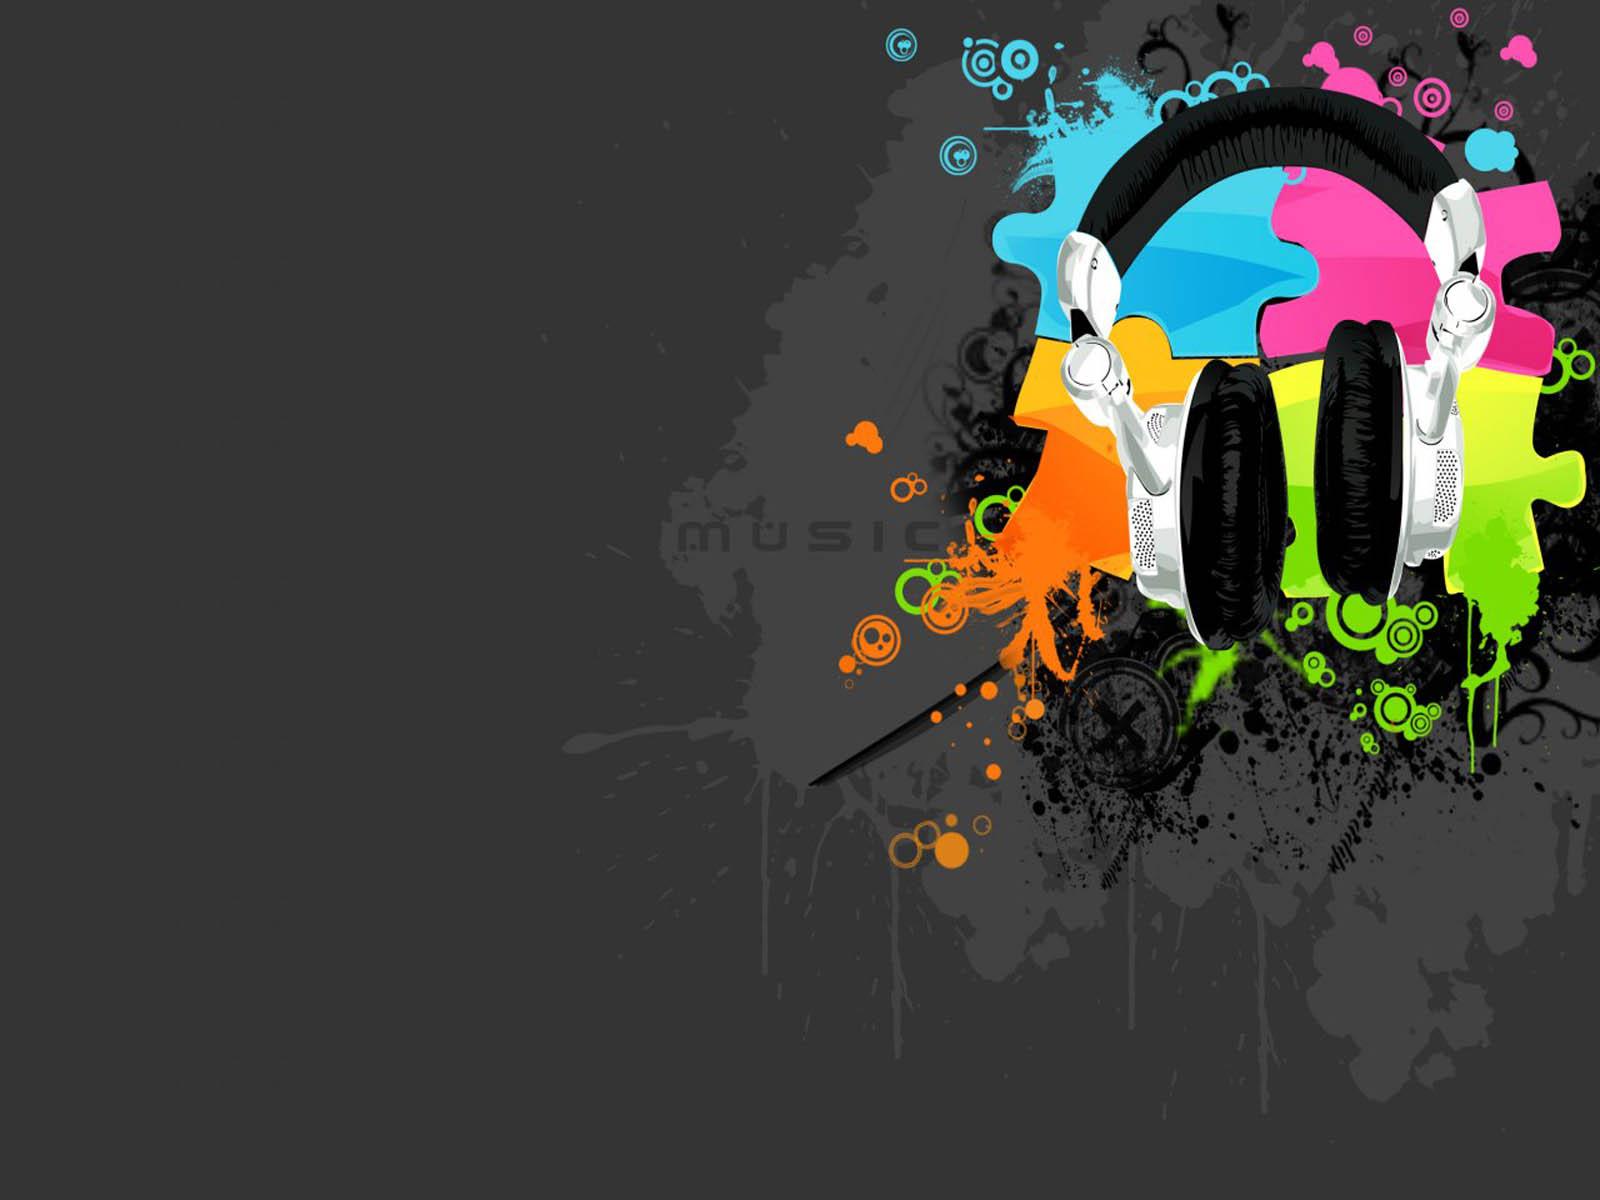 Abstract Music Wallpaper Desktop - Scerbos com